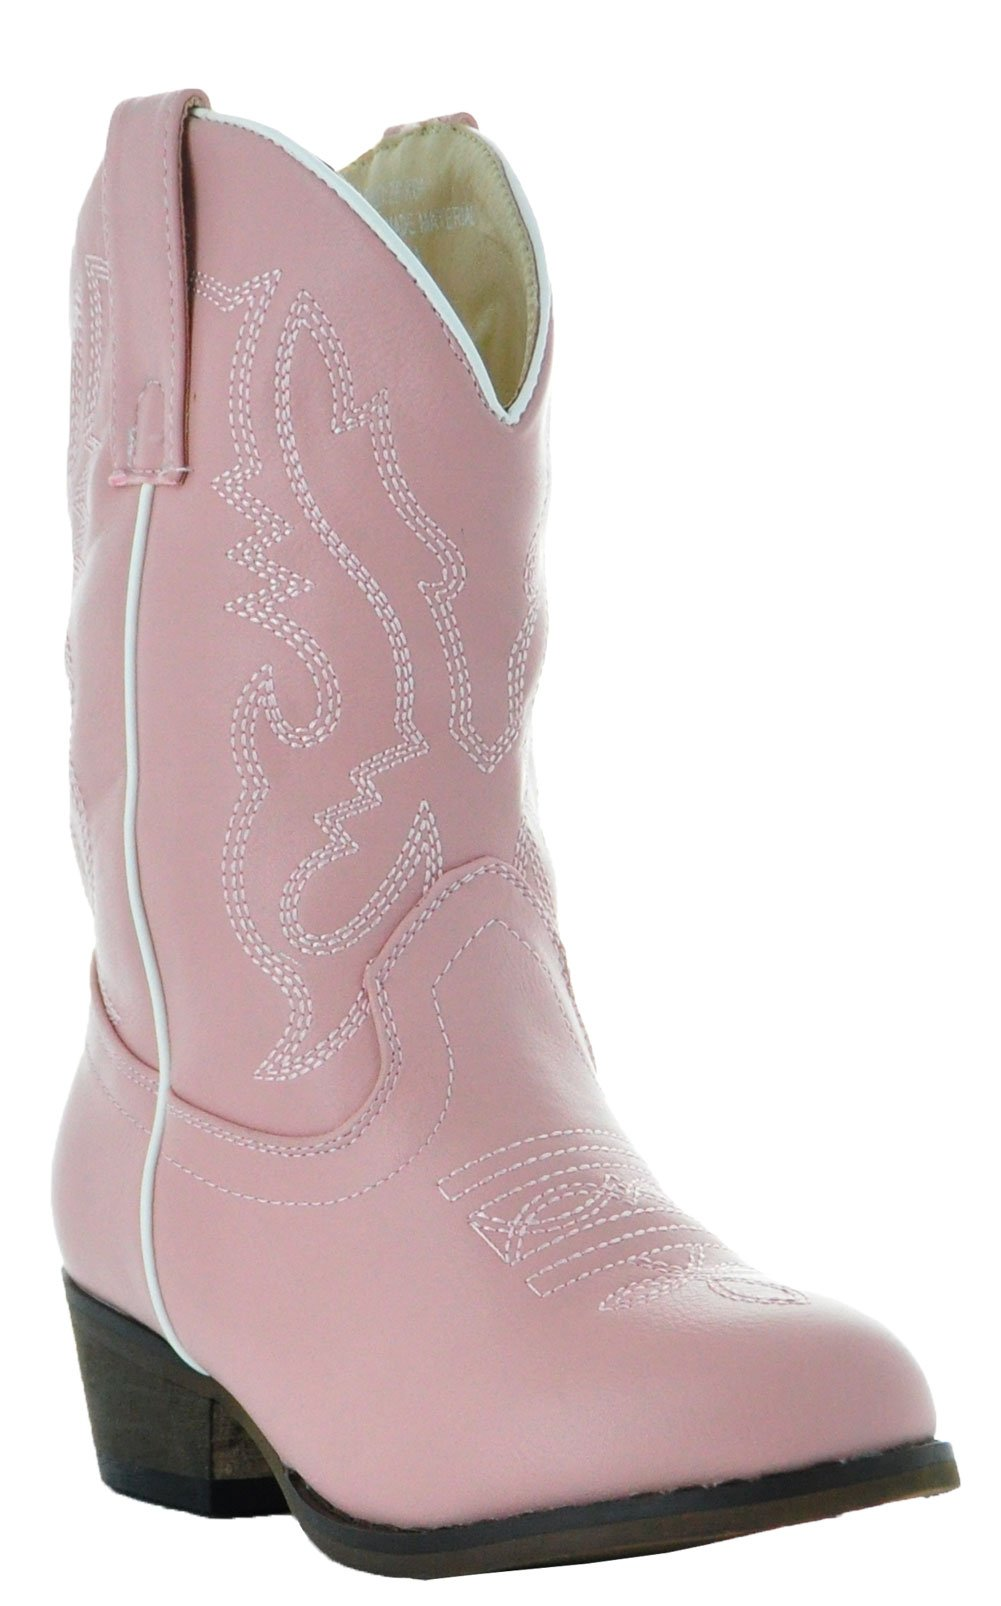 Country Love Little Rancher Kids Cowboy Boots K101-1001 (11 Little Kid, Pink)